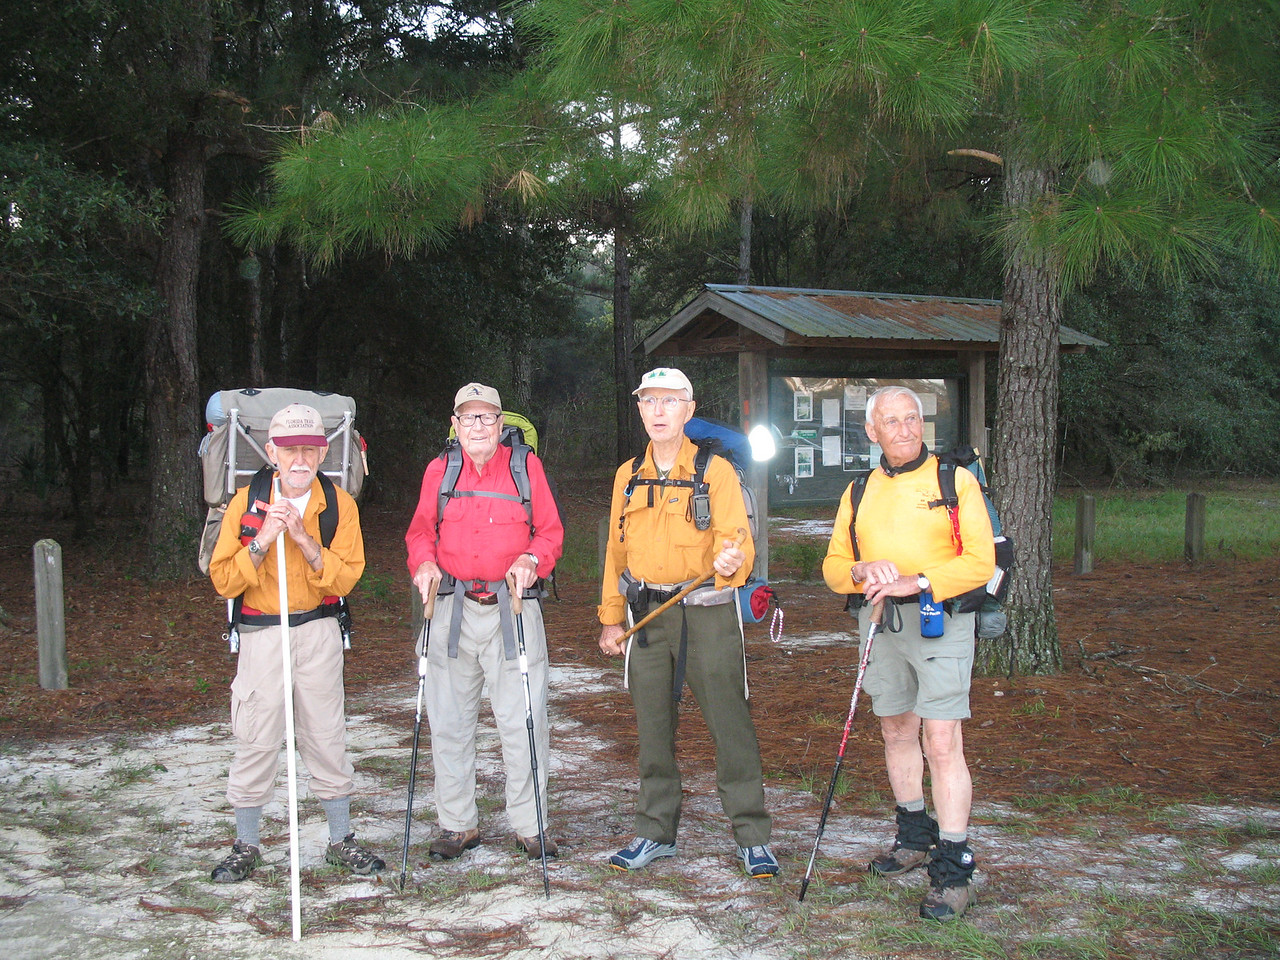 Nov 3: At Marshall Swamp Trailhead. Charlie, Cliff, Ken, and Al.